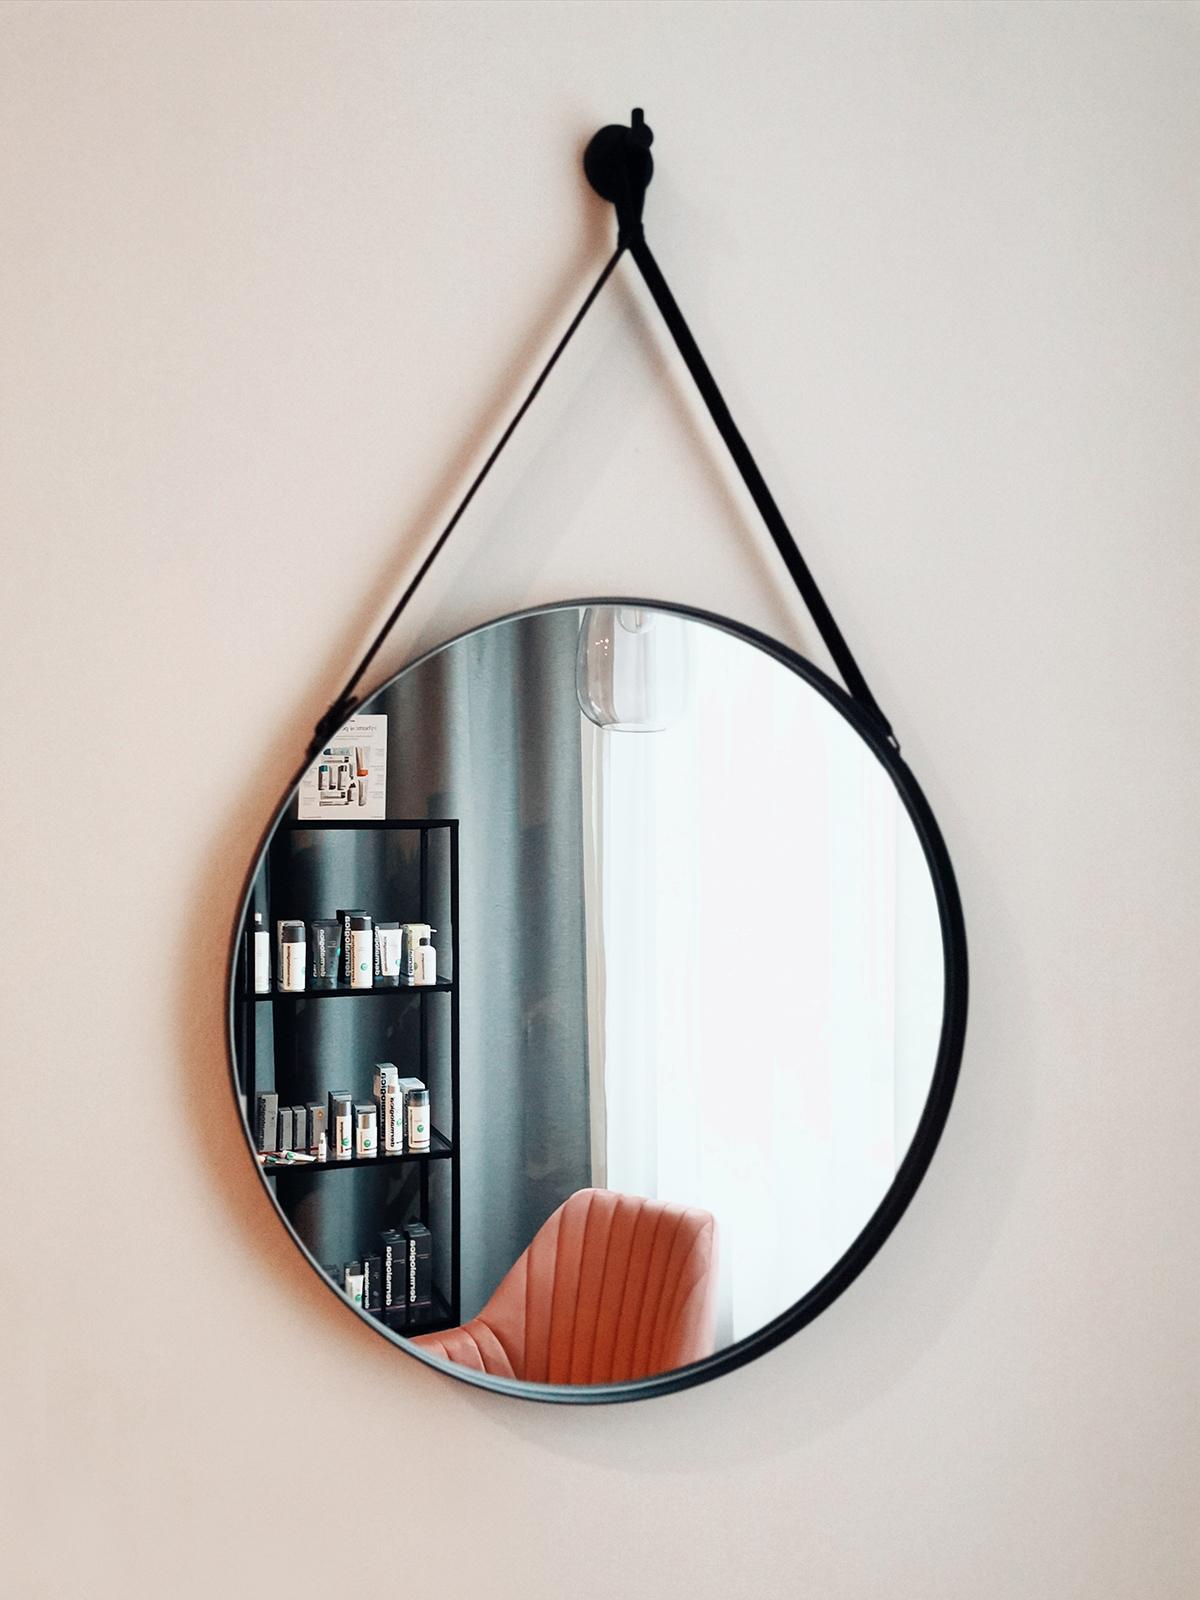 kosmetický salon, tranquility, josef trakal